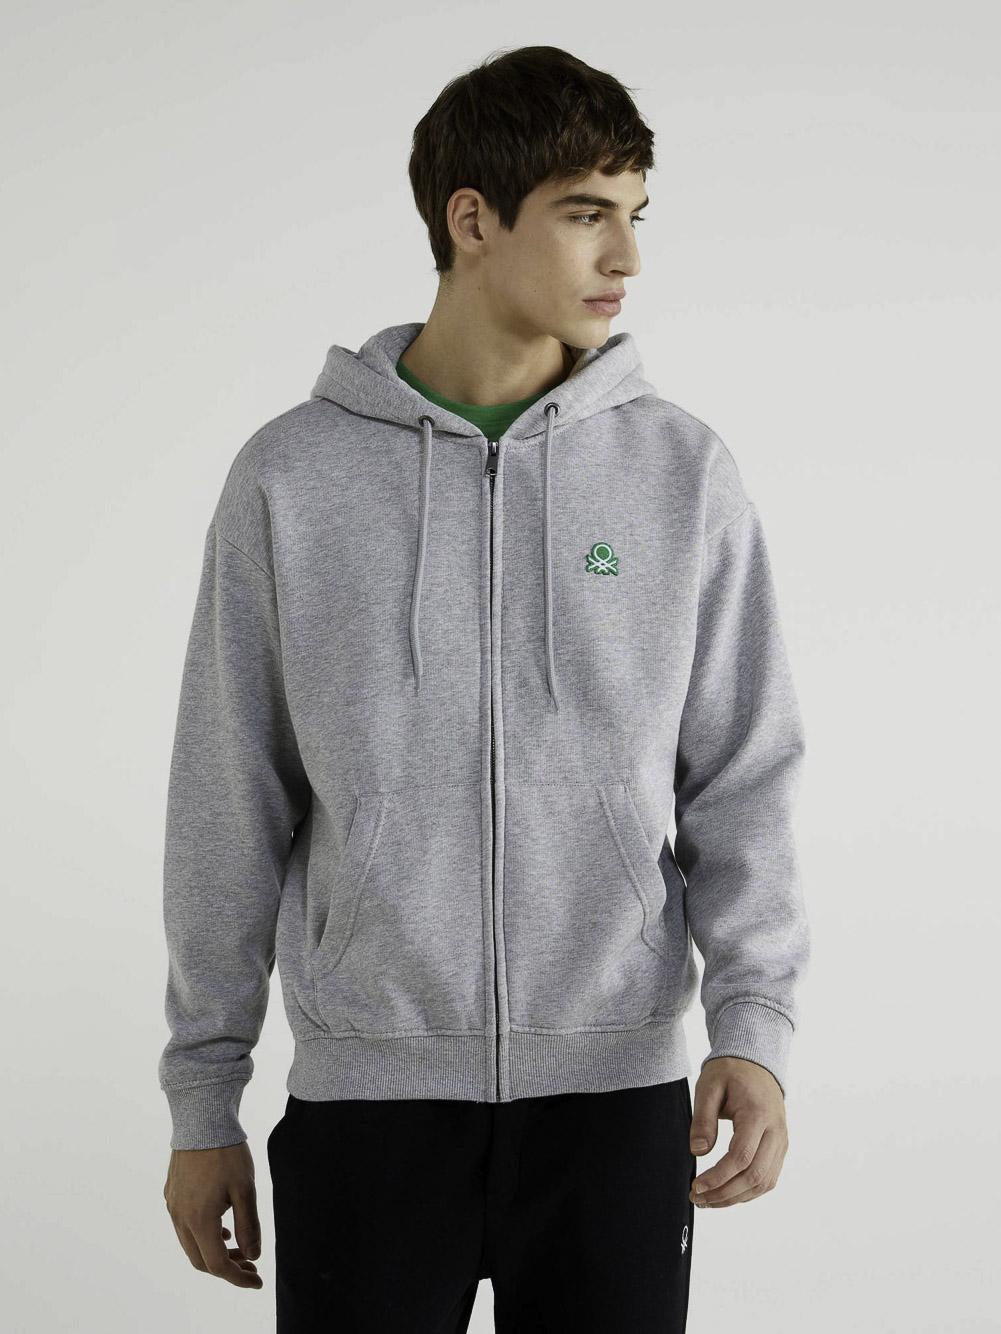 BENETTON Φούτερ με τσέπες και κουκούλα 3J73J5217 20A501